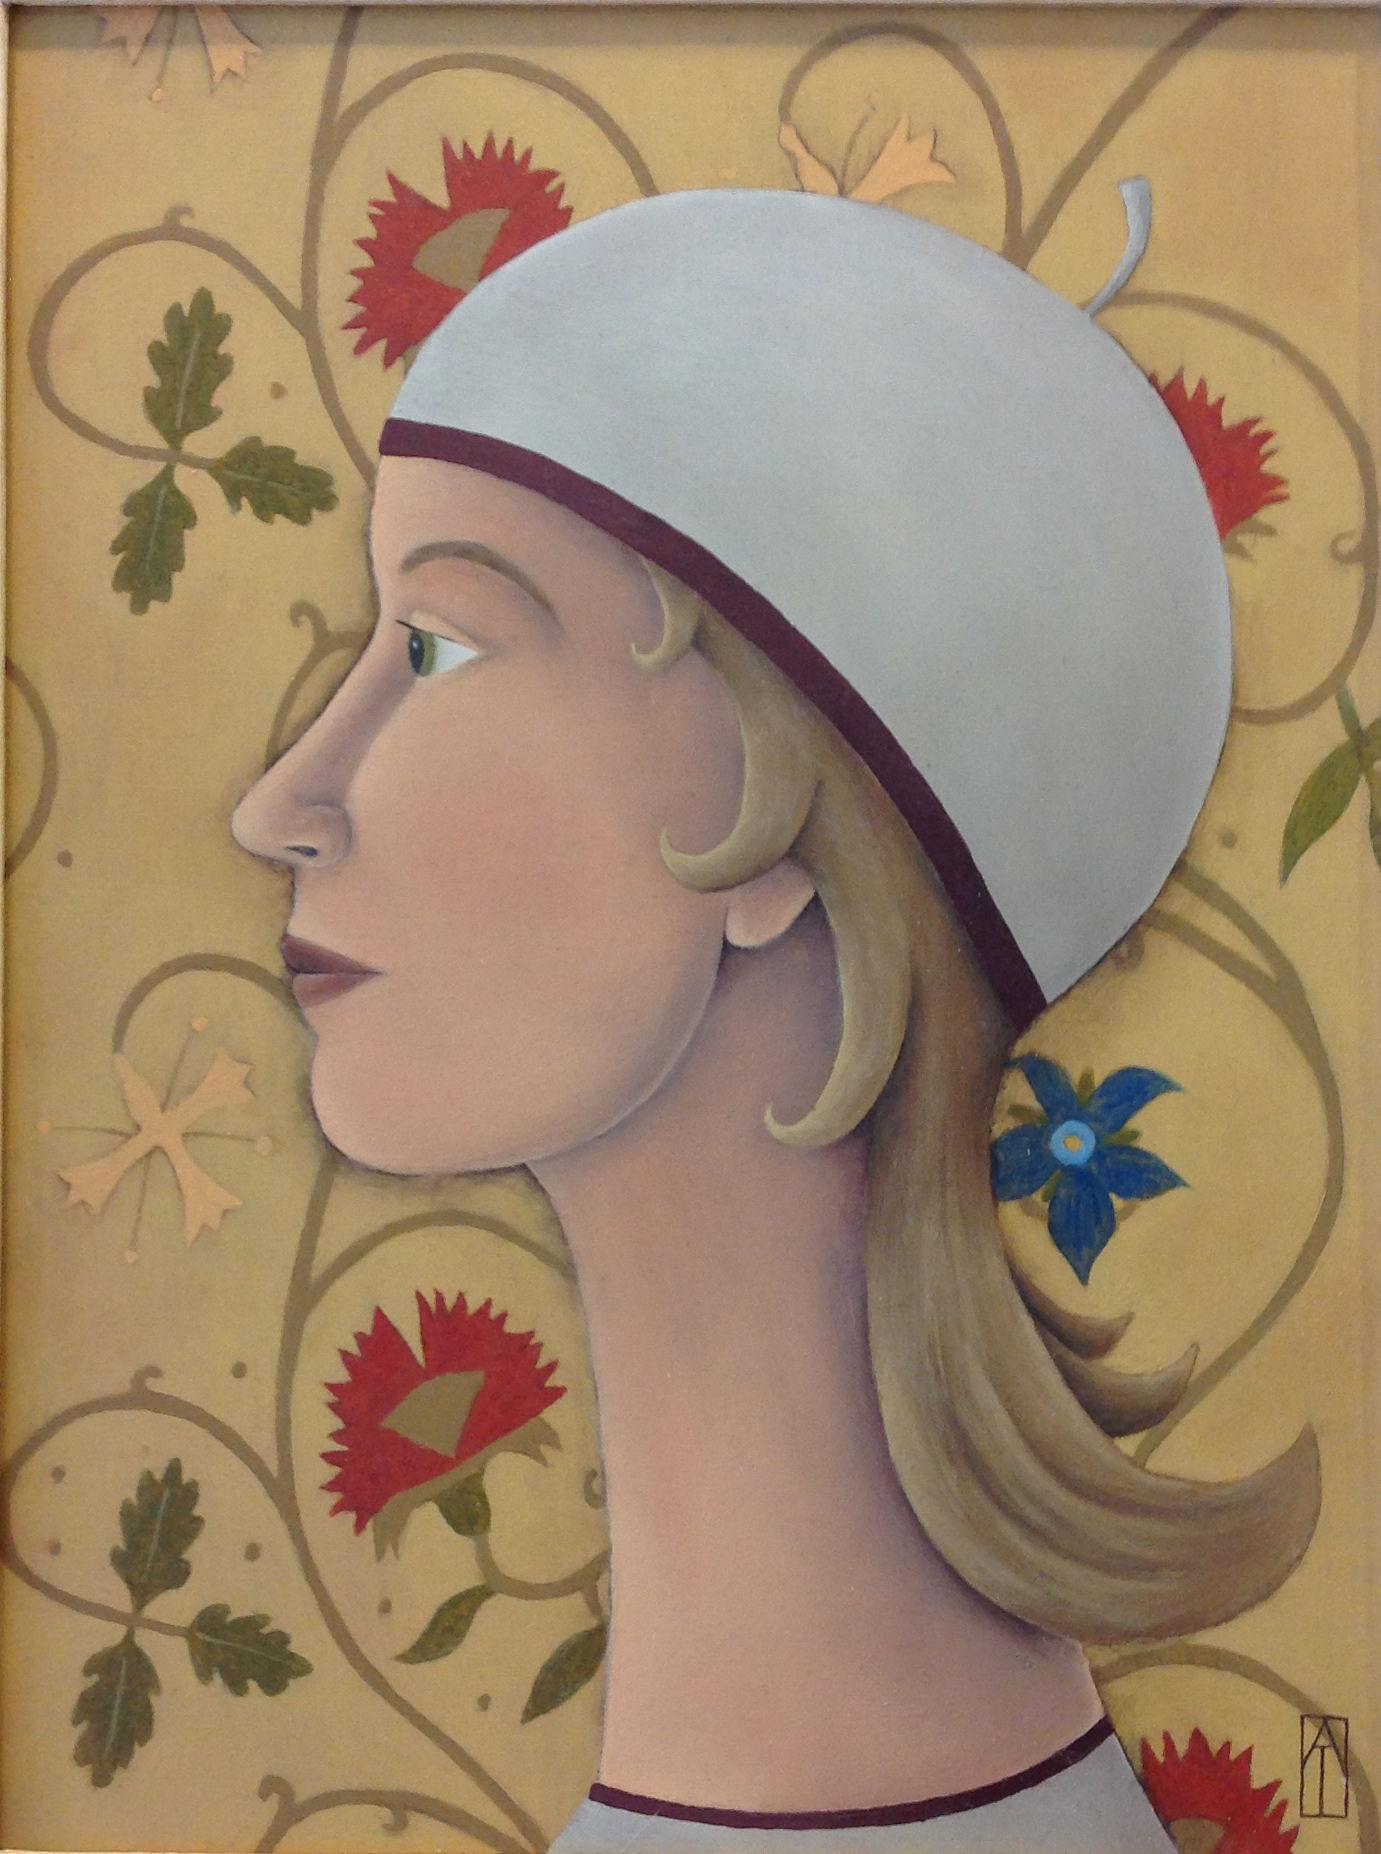 'Juliet' by artist Alison Thomas